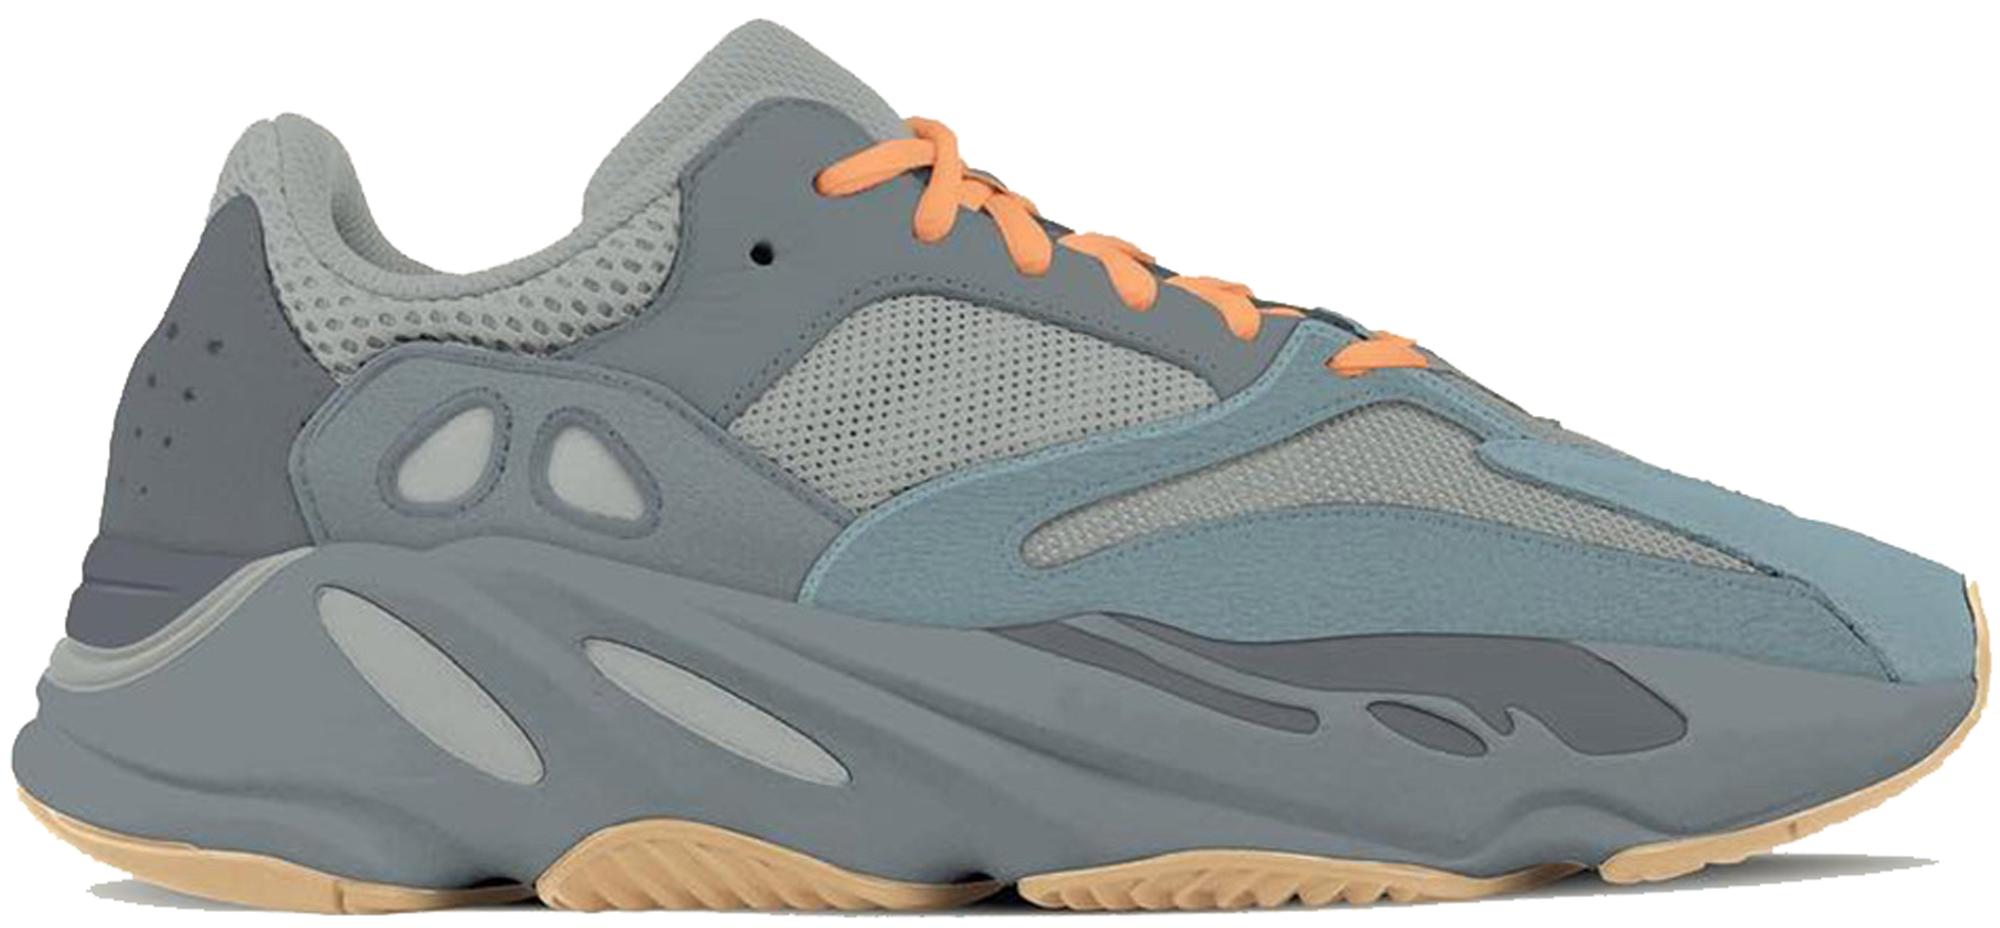 adidas Yeezy Boost 700 Teal Blue • Buy